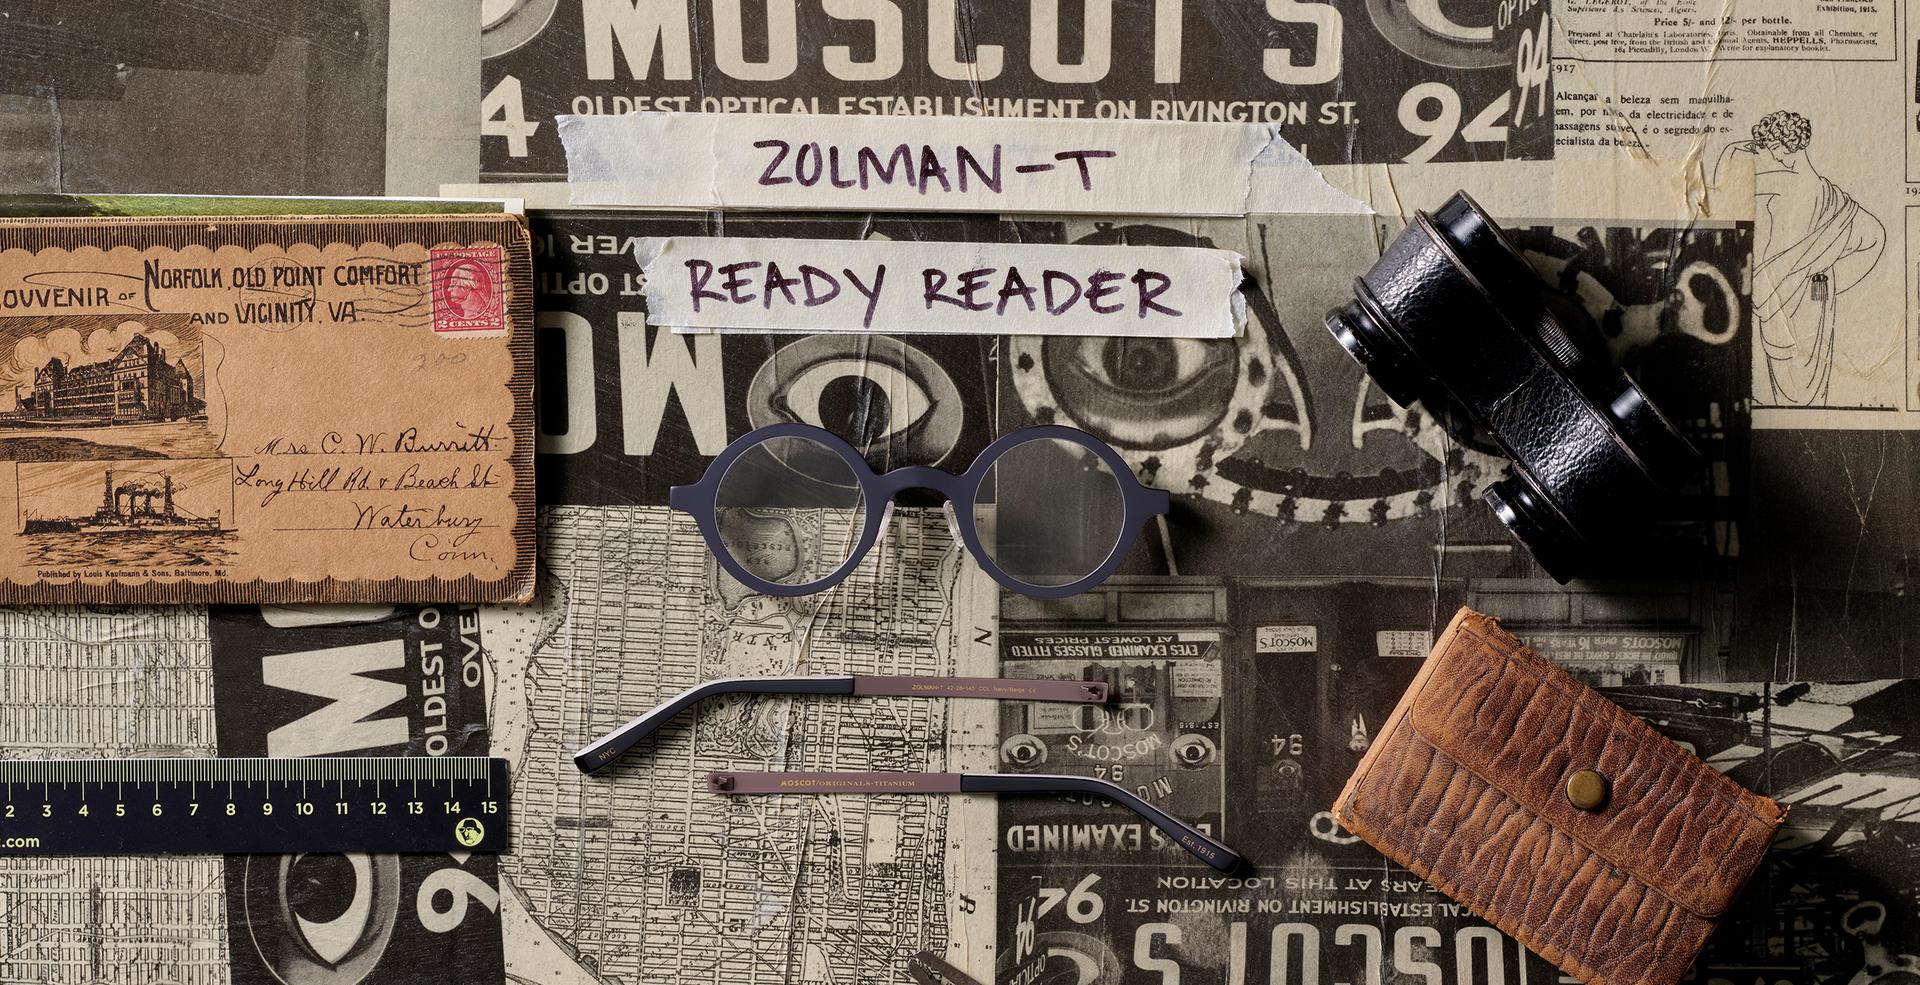 ZOLMAN-T READY READER